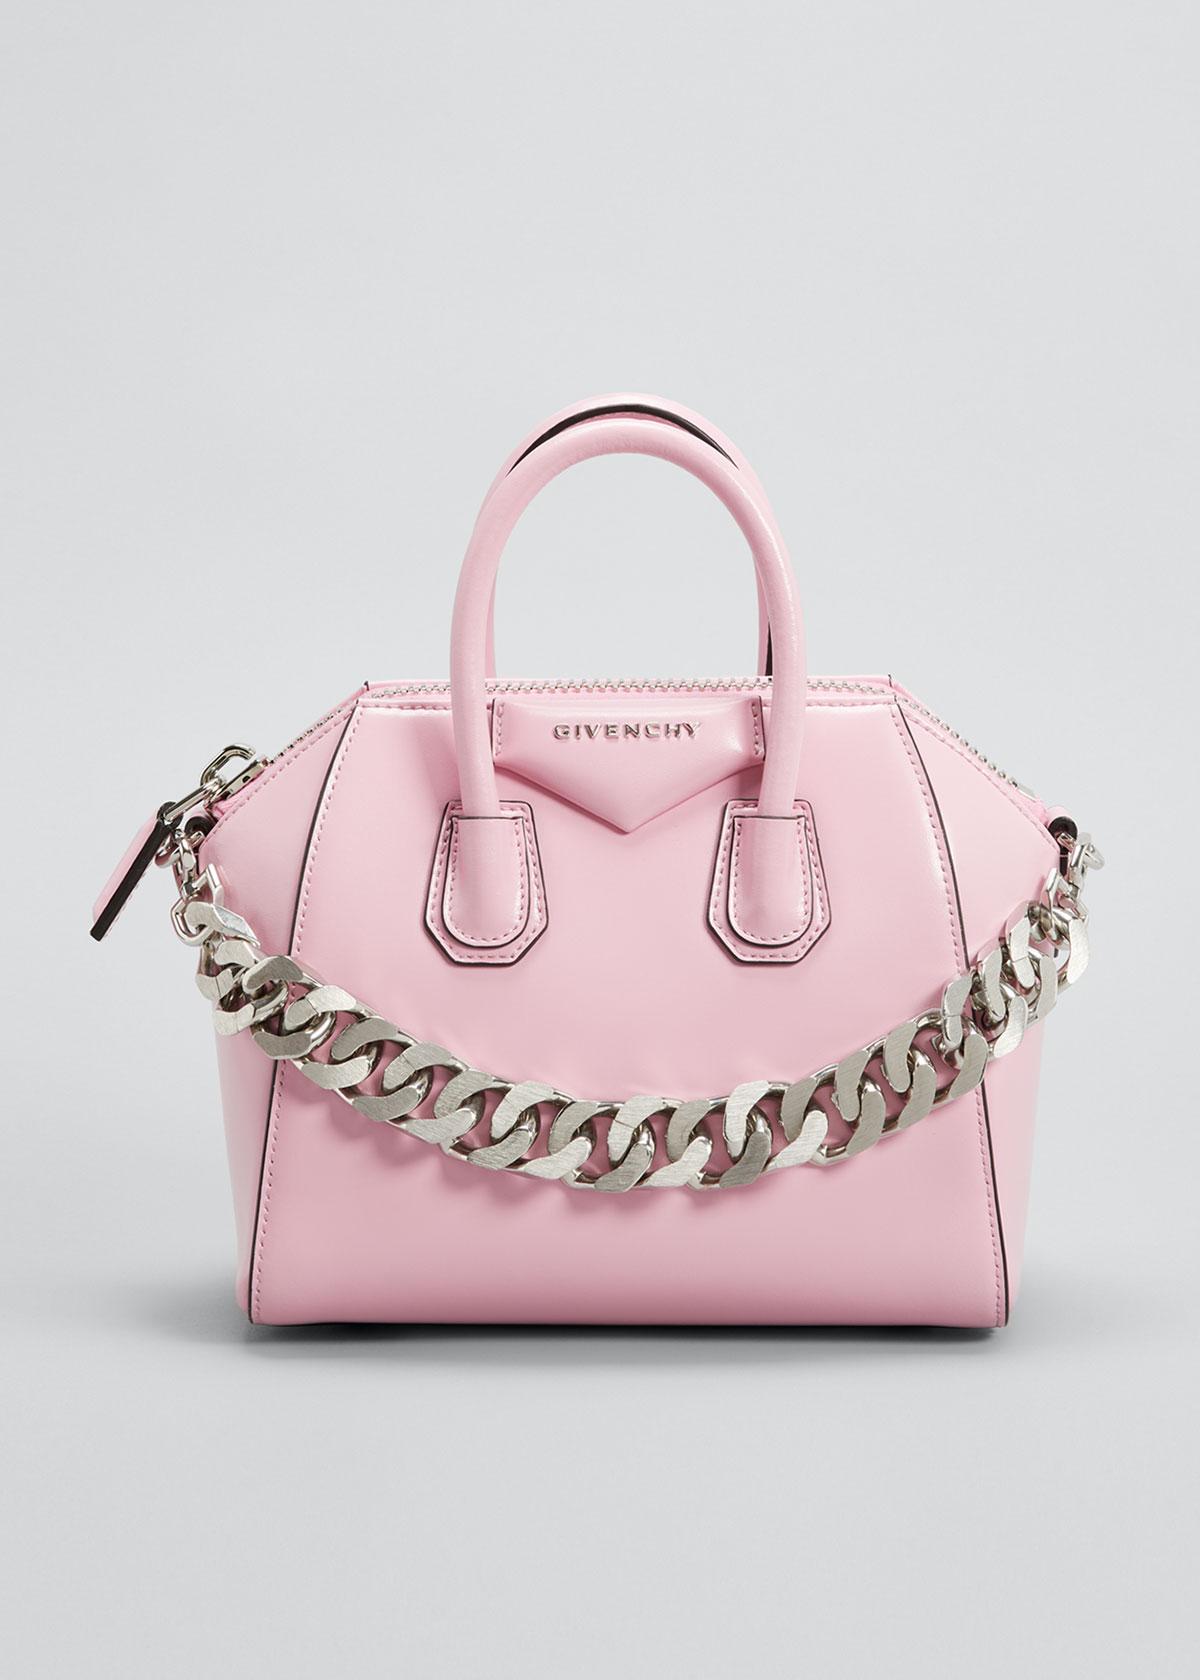 Givenchy Leathers MINI ANTIGONA BAG WITH CHAIN